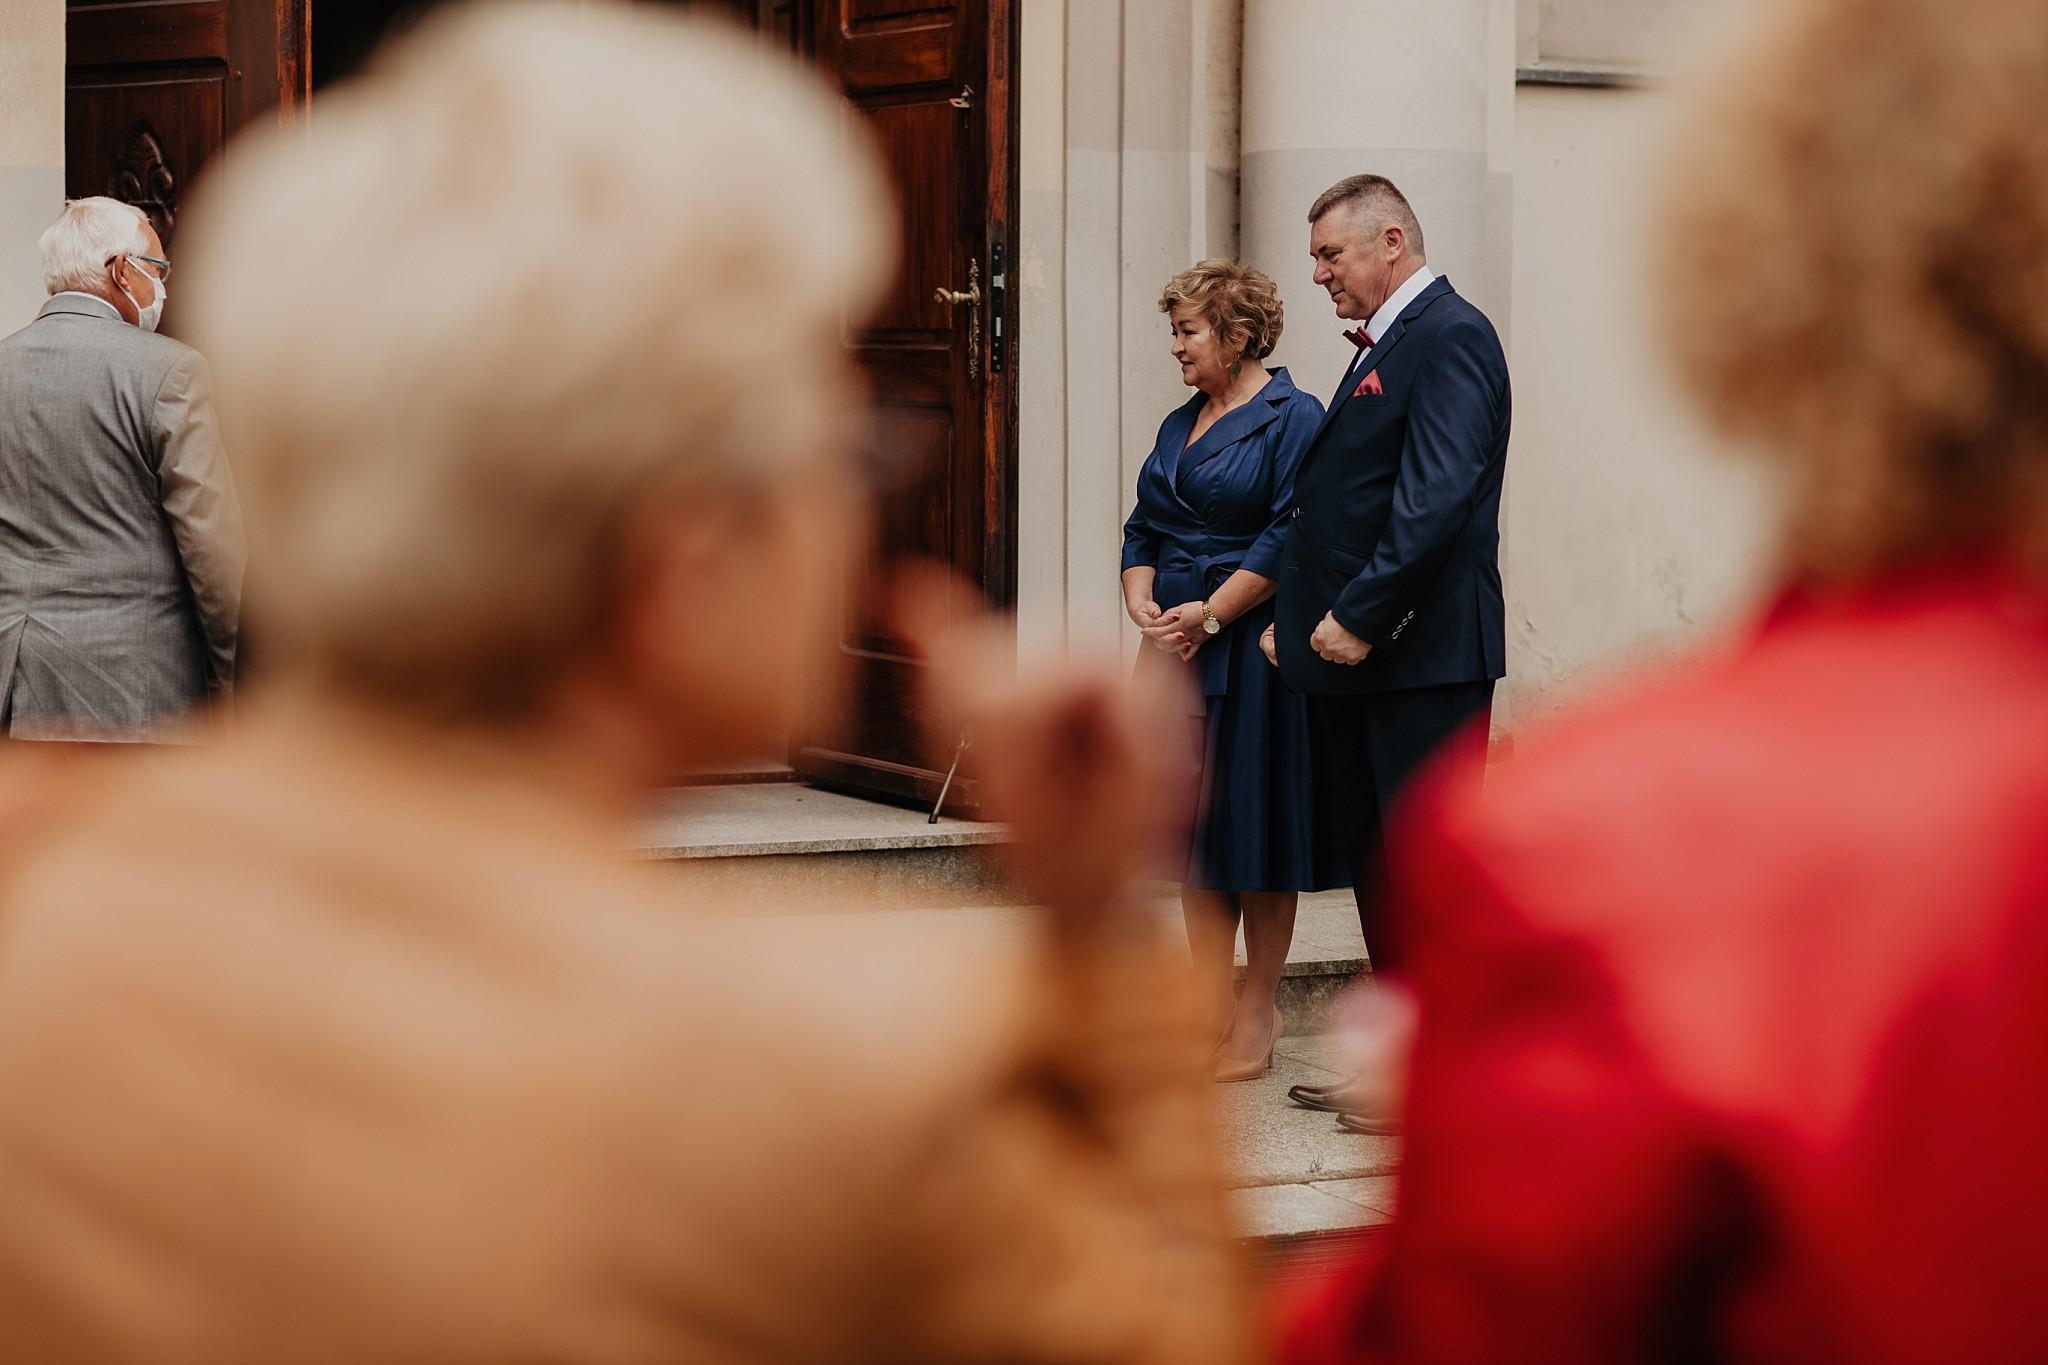 fotograf poznan wesele dobra truskawka piekne wesele pod poznaniem wesele w dobrej truskawce piekna para mloda slub marzen slub koronawirus slub listopad wesele koronawirus 118